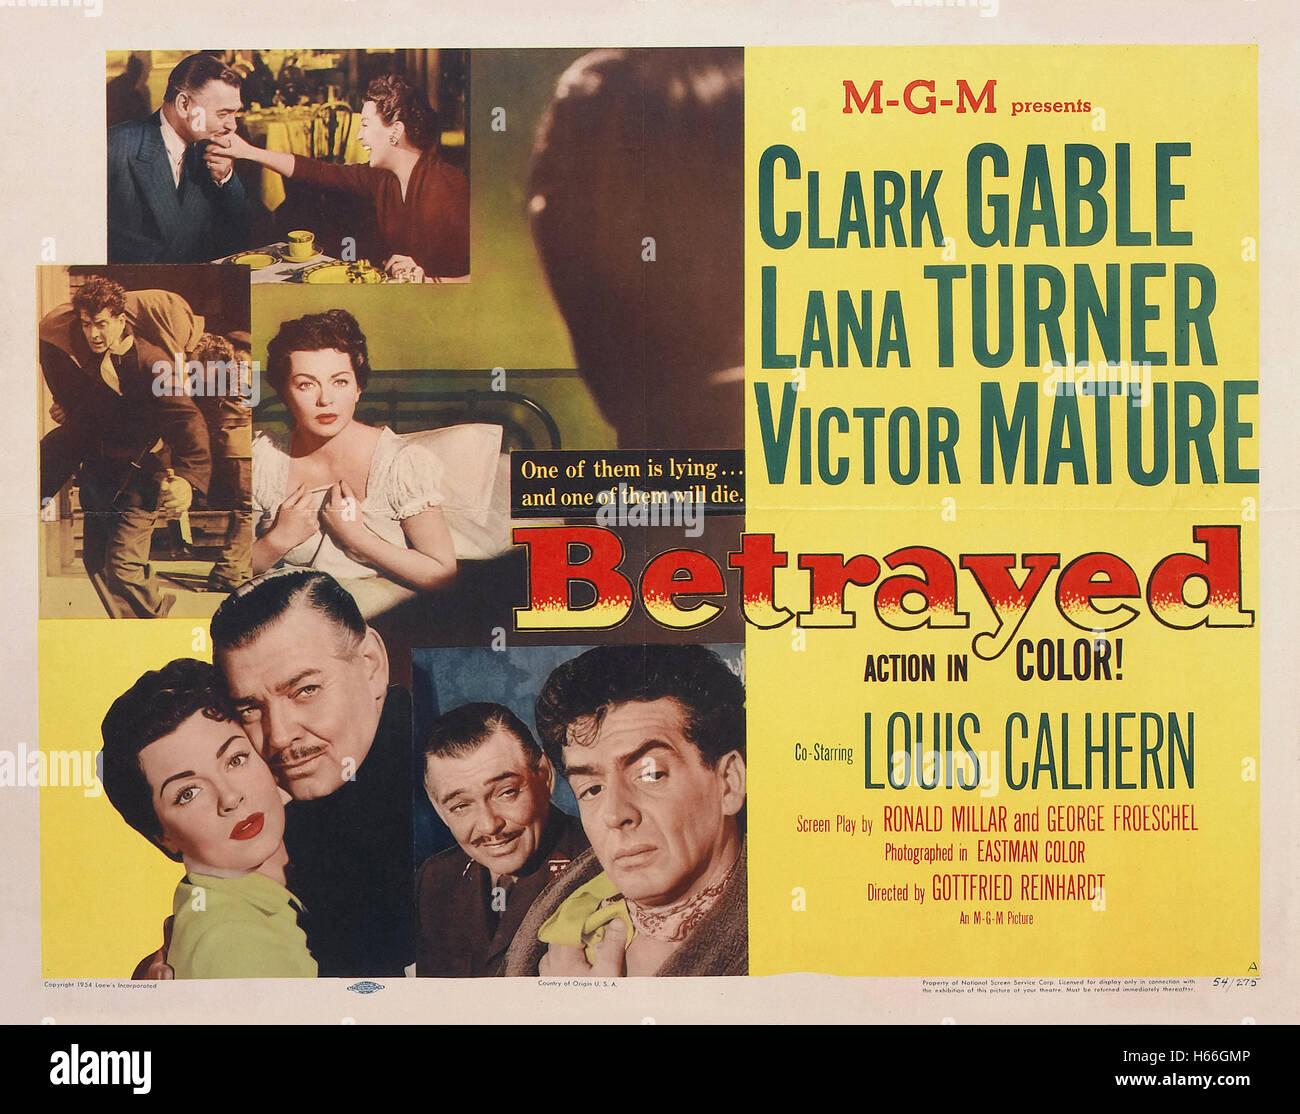 Betrayed (1954) - Movie Poster - - Stock Image